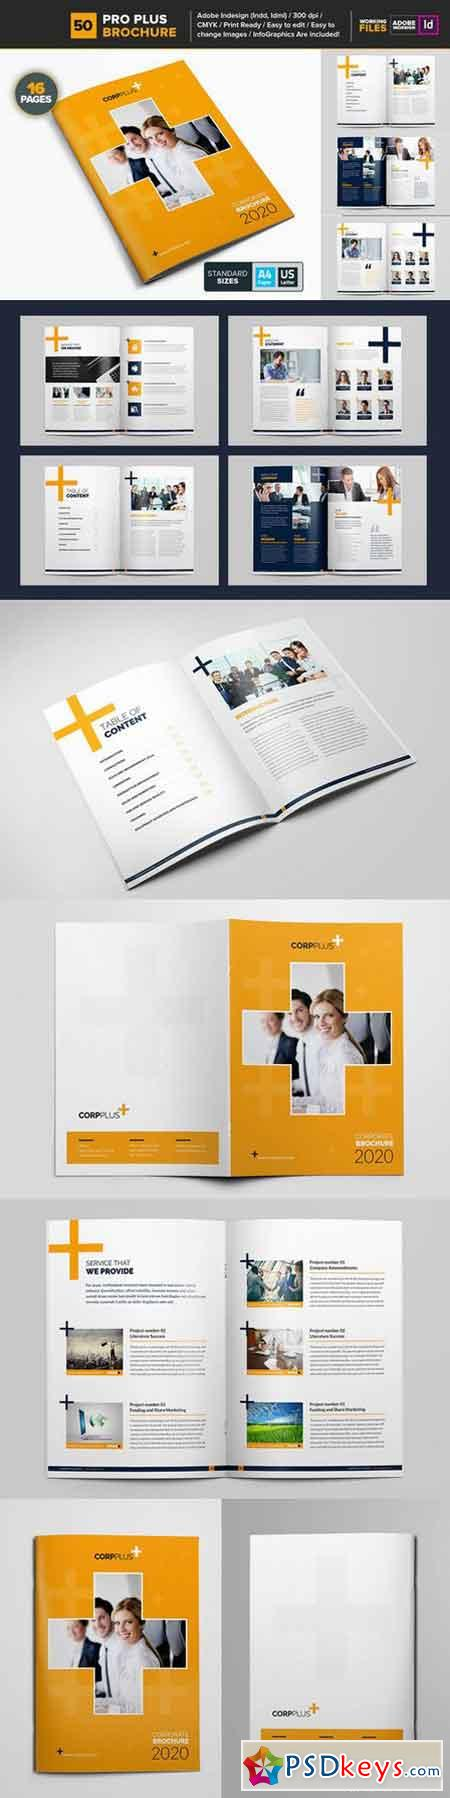 Multipurpose Brochure Template 50 795208